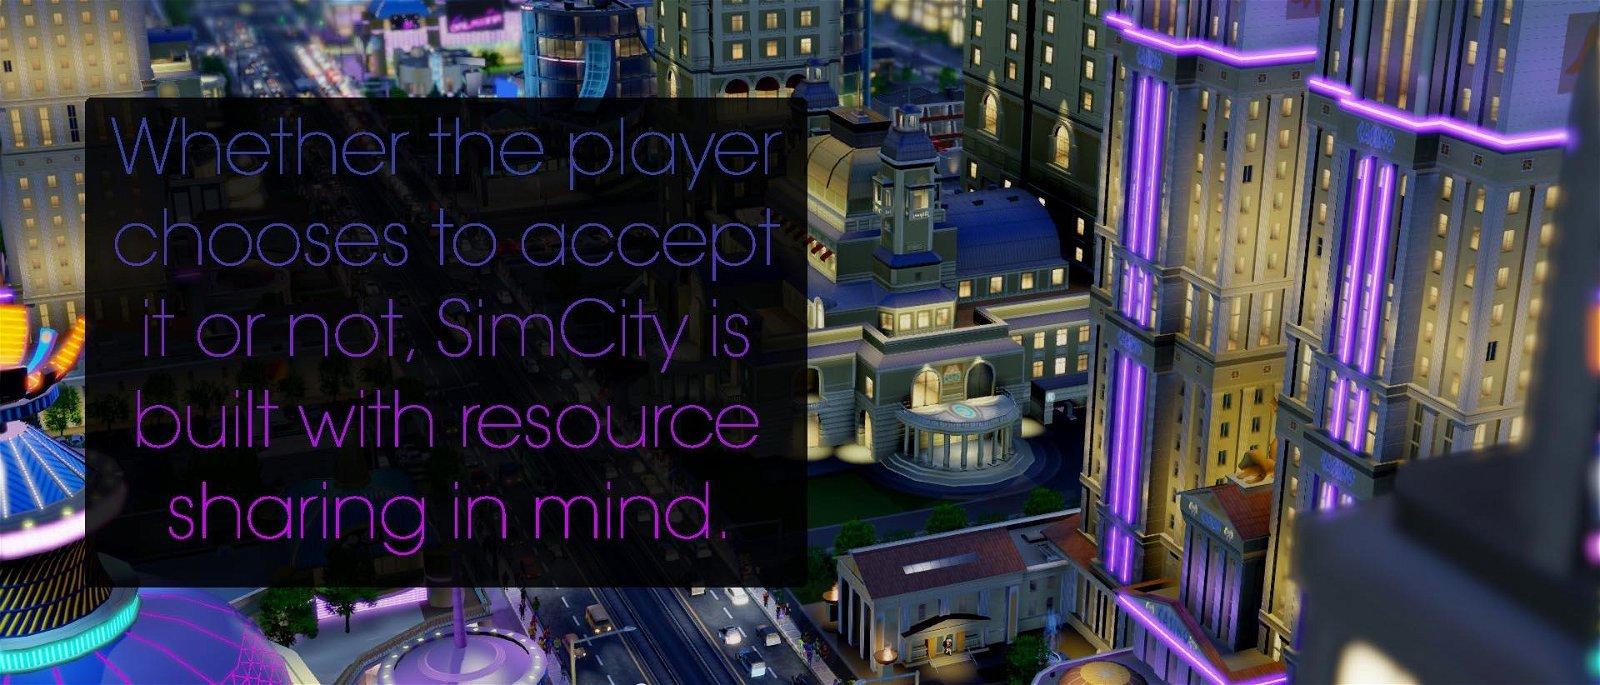 Simcityquoteimage.jpg